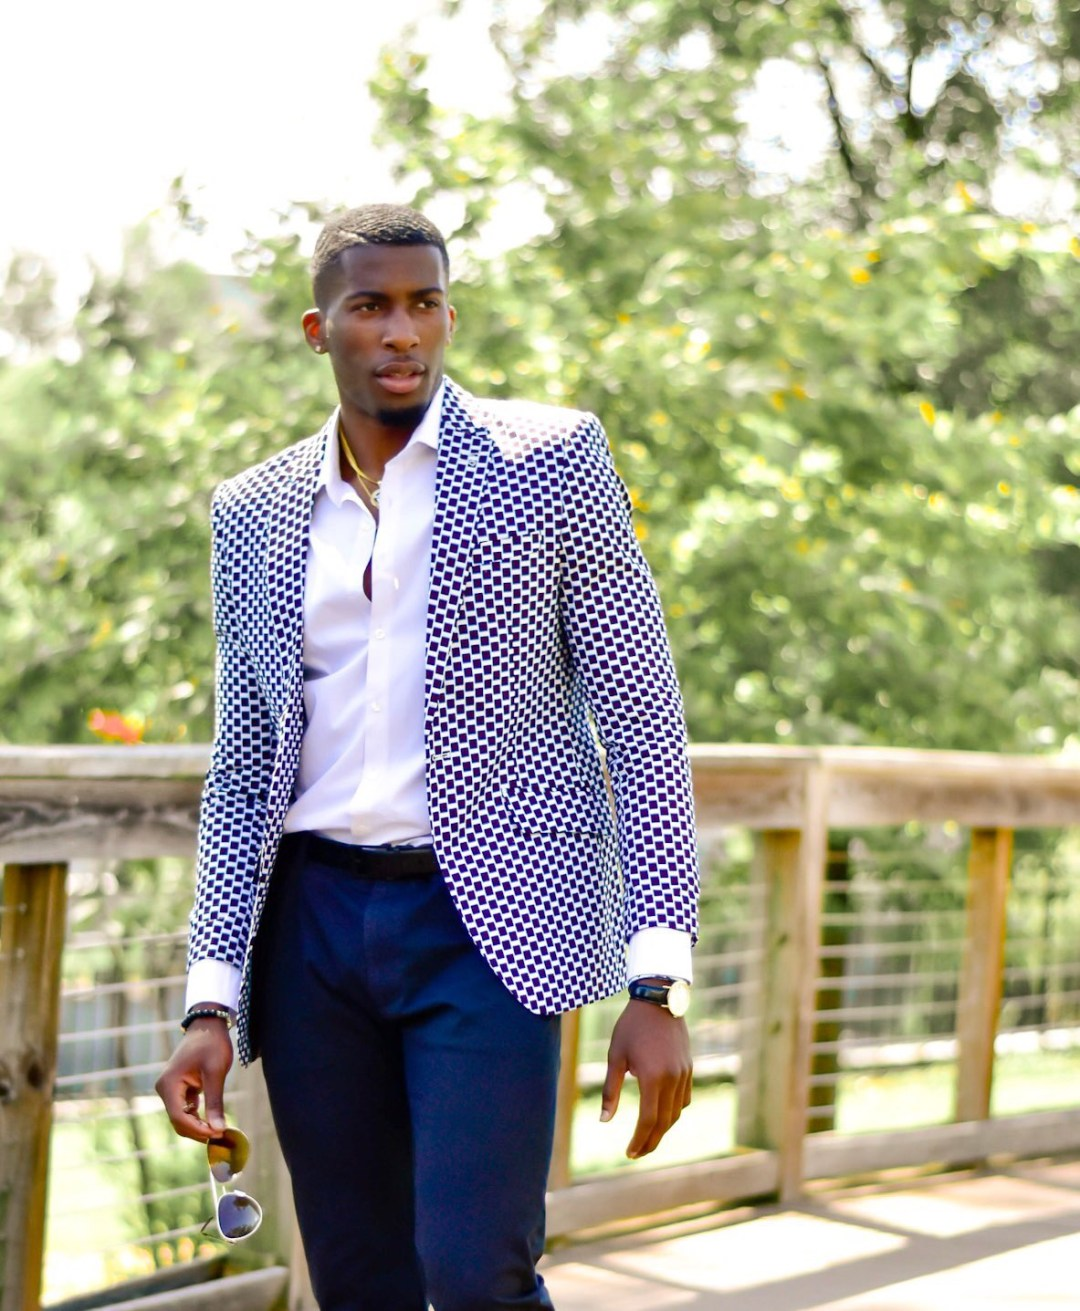 Daniel Obiefuna Nwandu, Fondu, Off guard Photography, Nigerian Male Model, Artist, Designer, Commissioner of Reflex Football, RFB, African Blazer, Men's Fashion